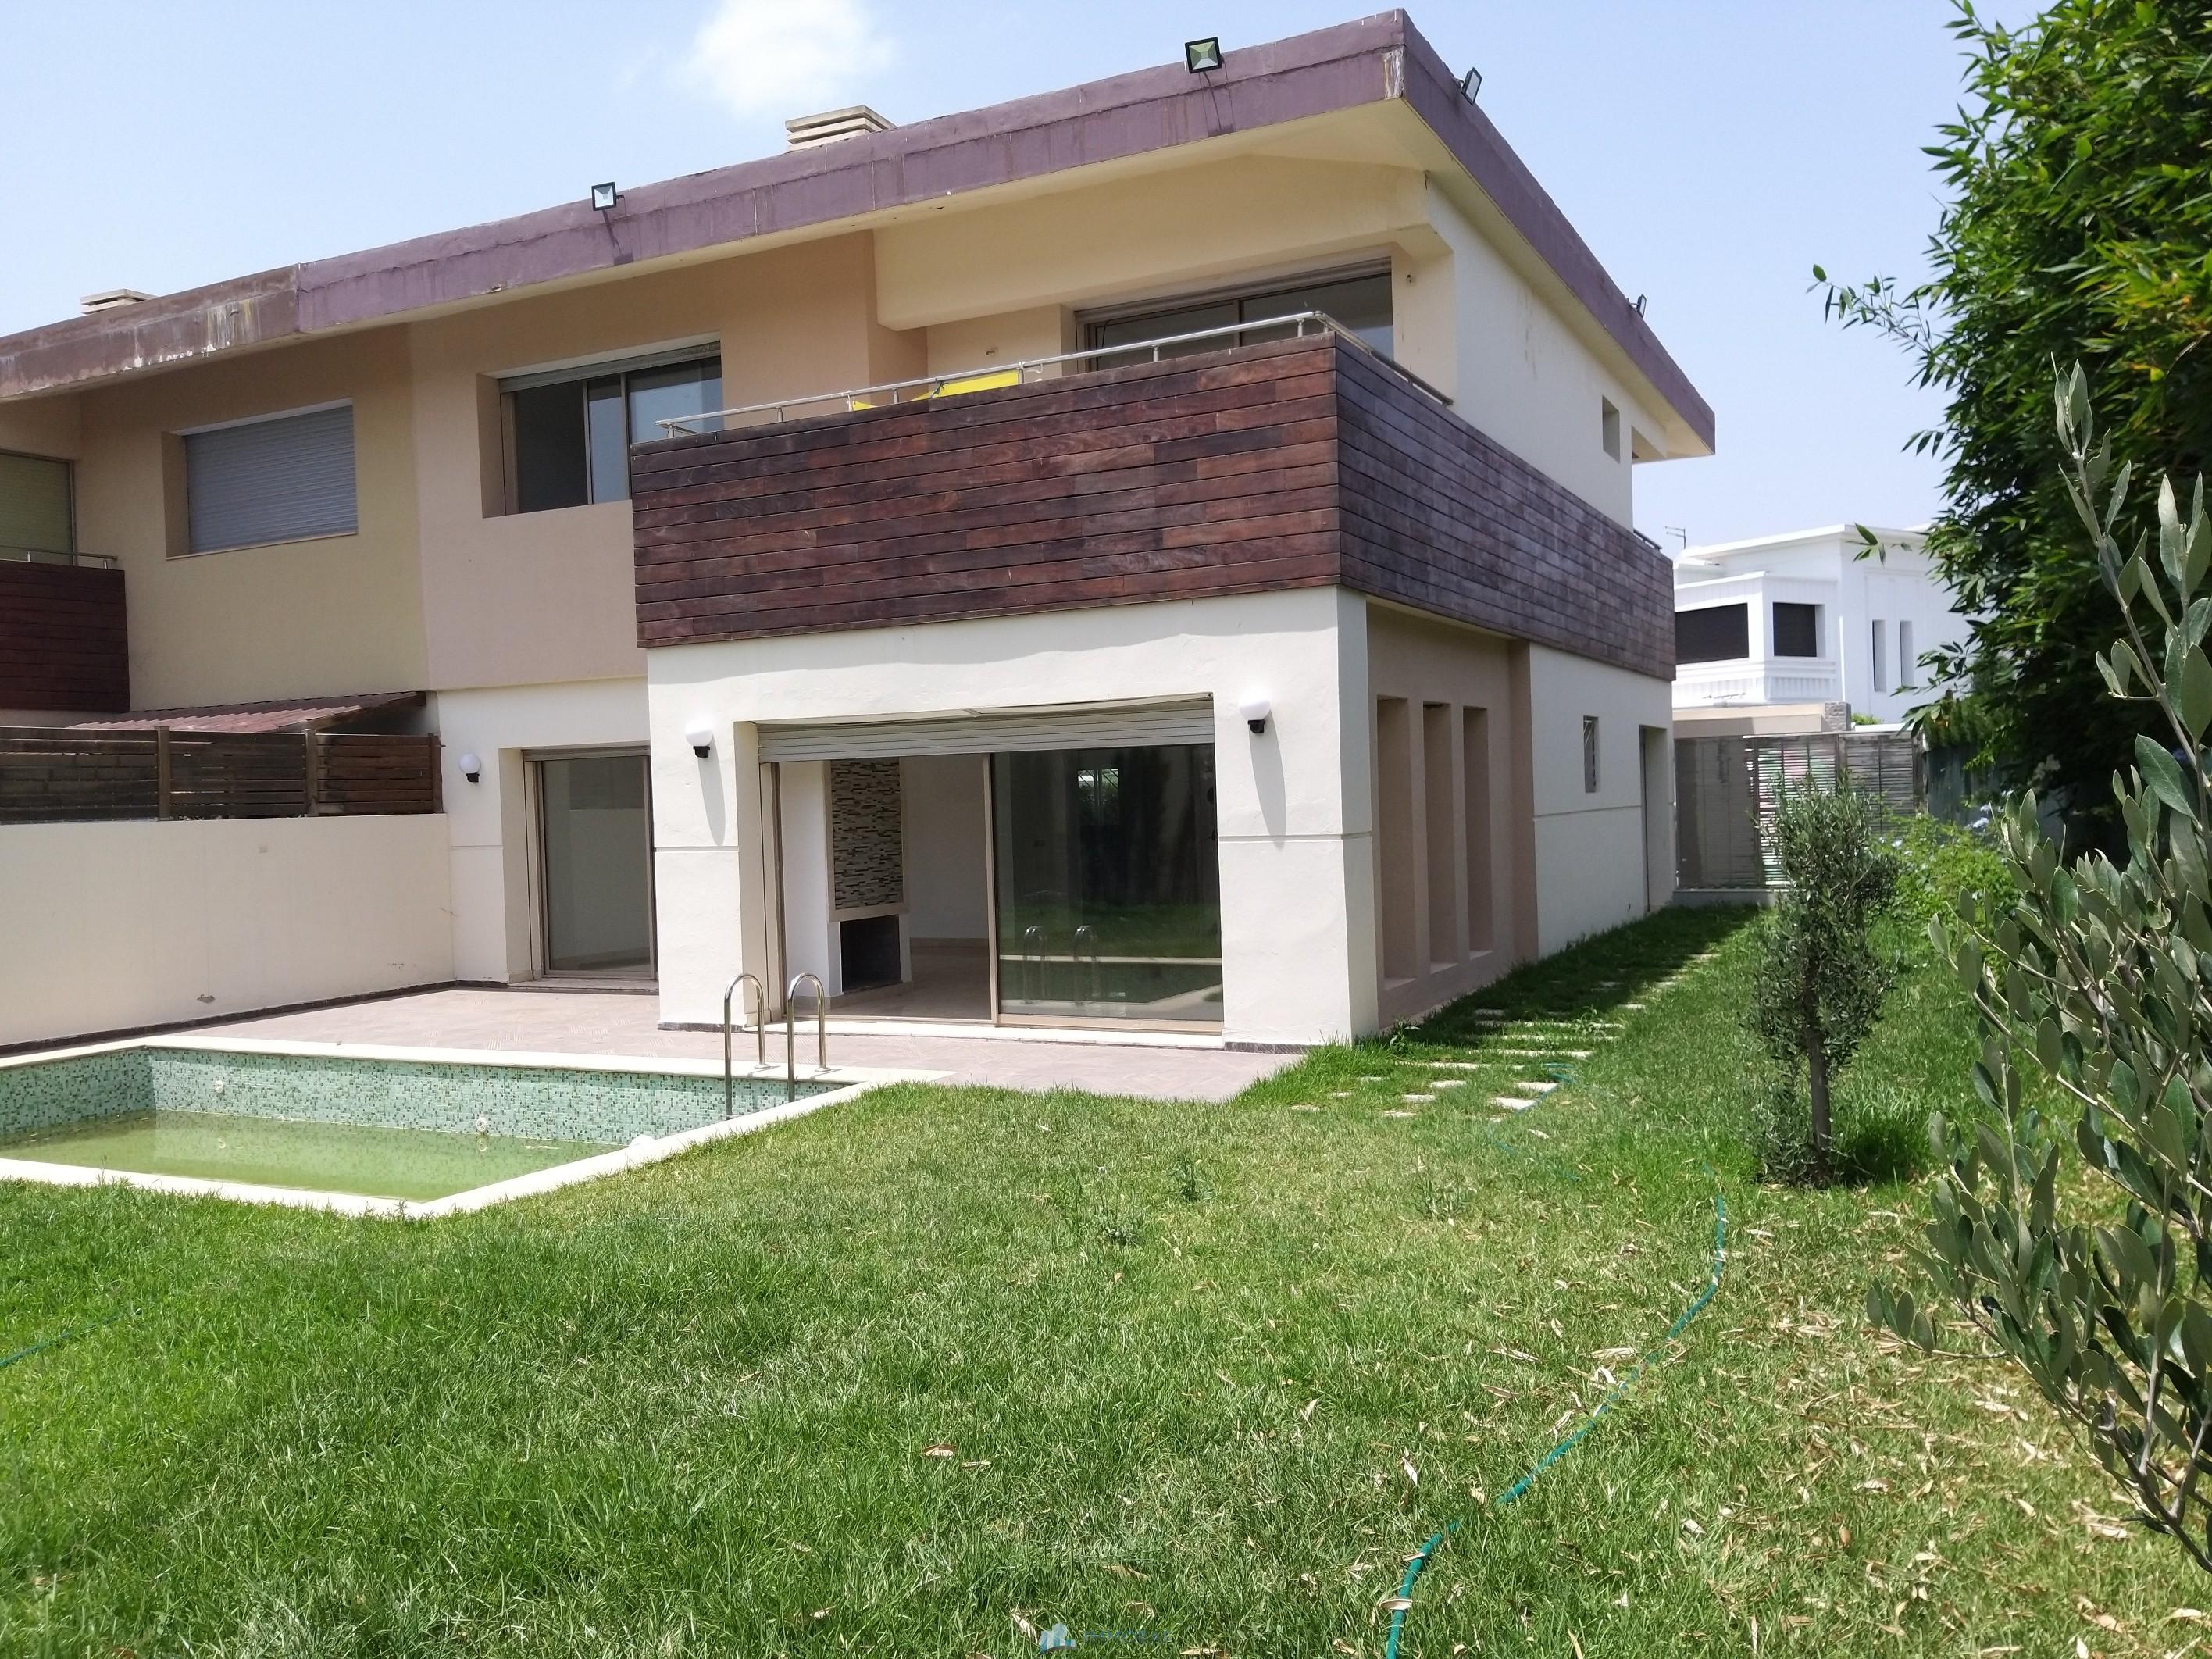 Location Villa vide Bouskoura casablanca